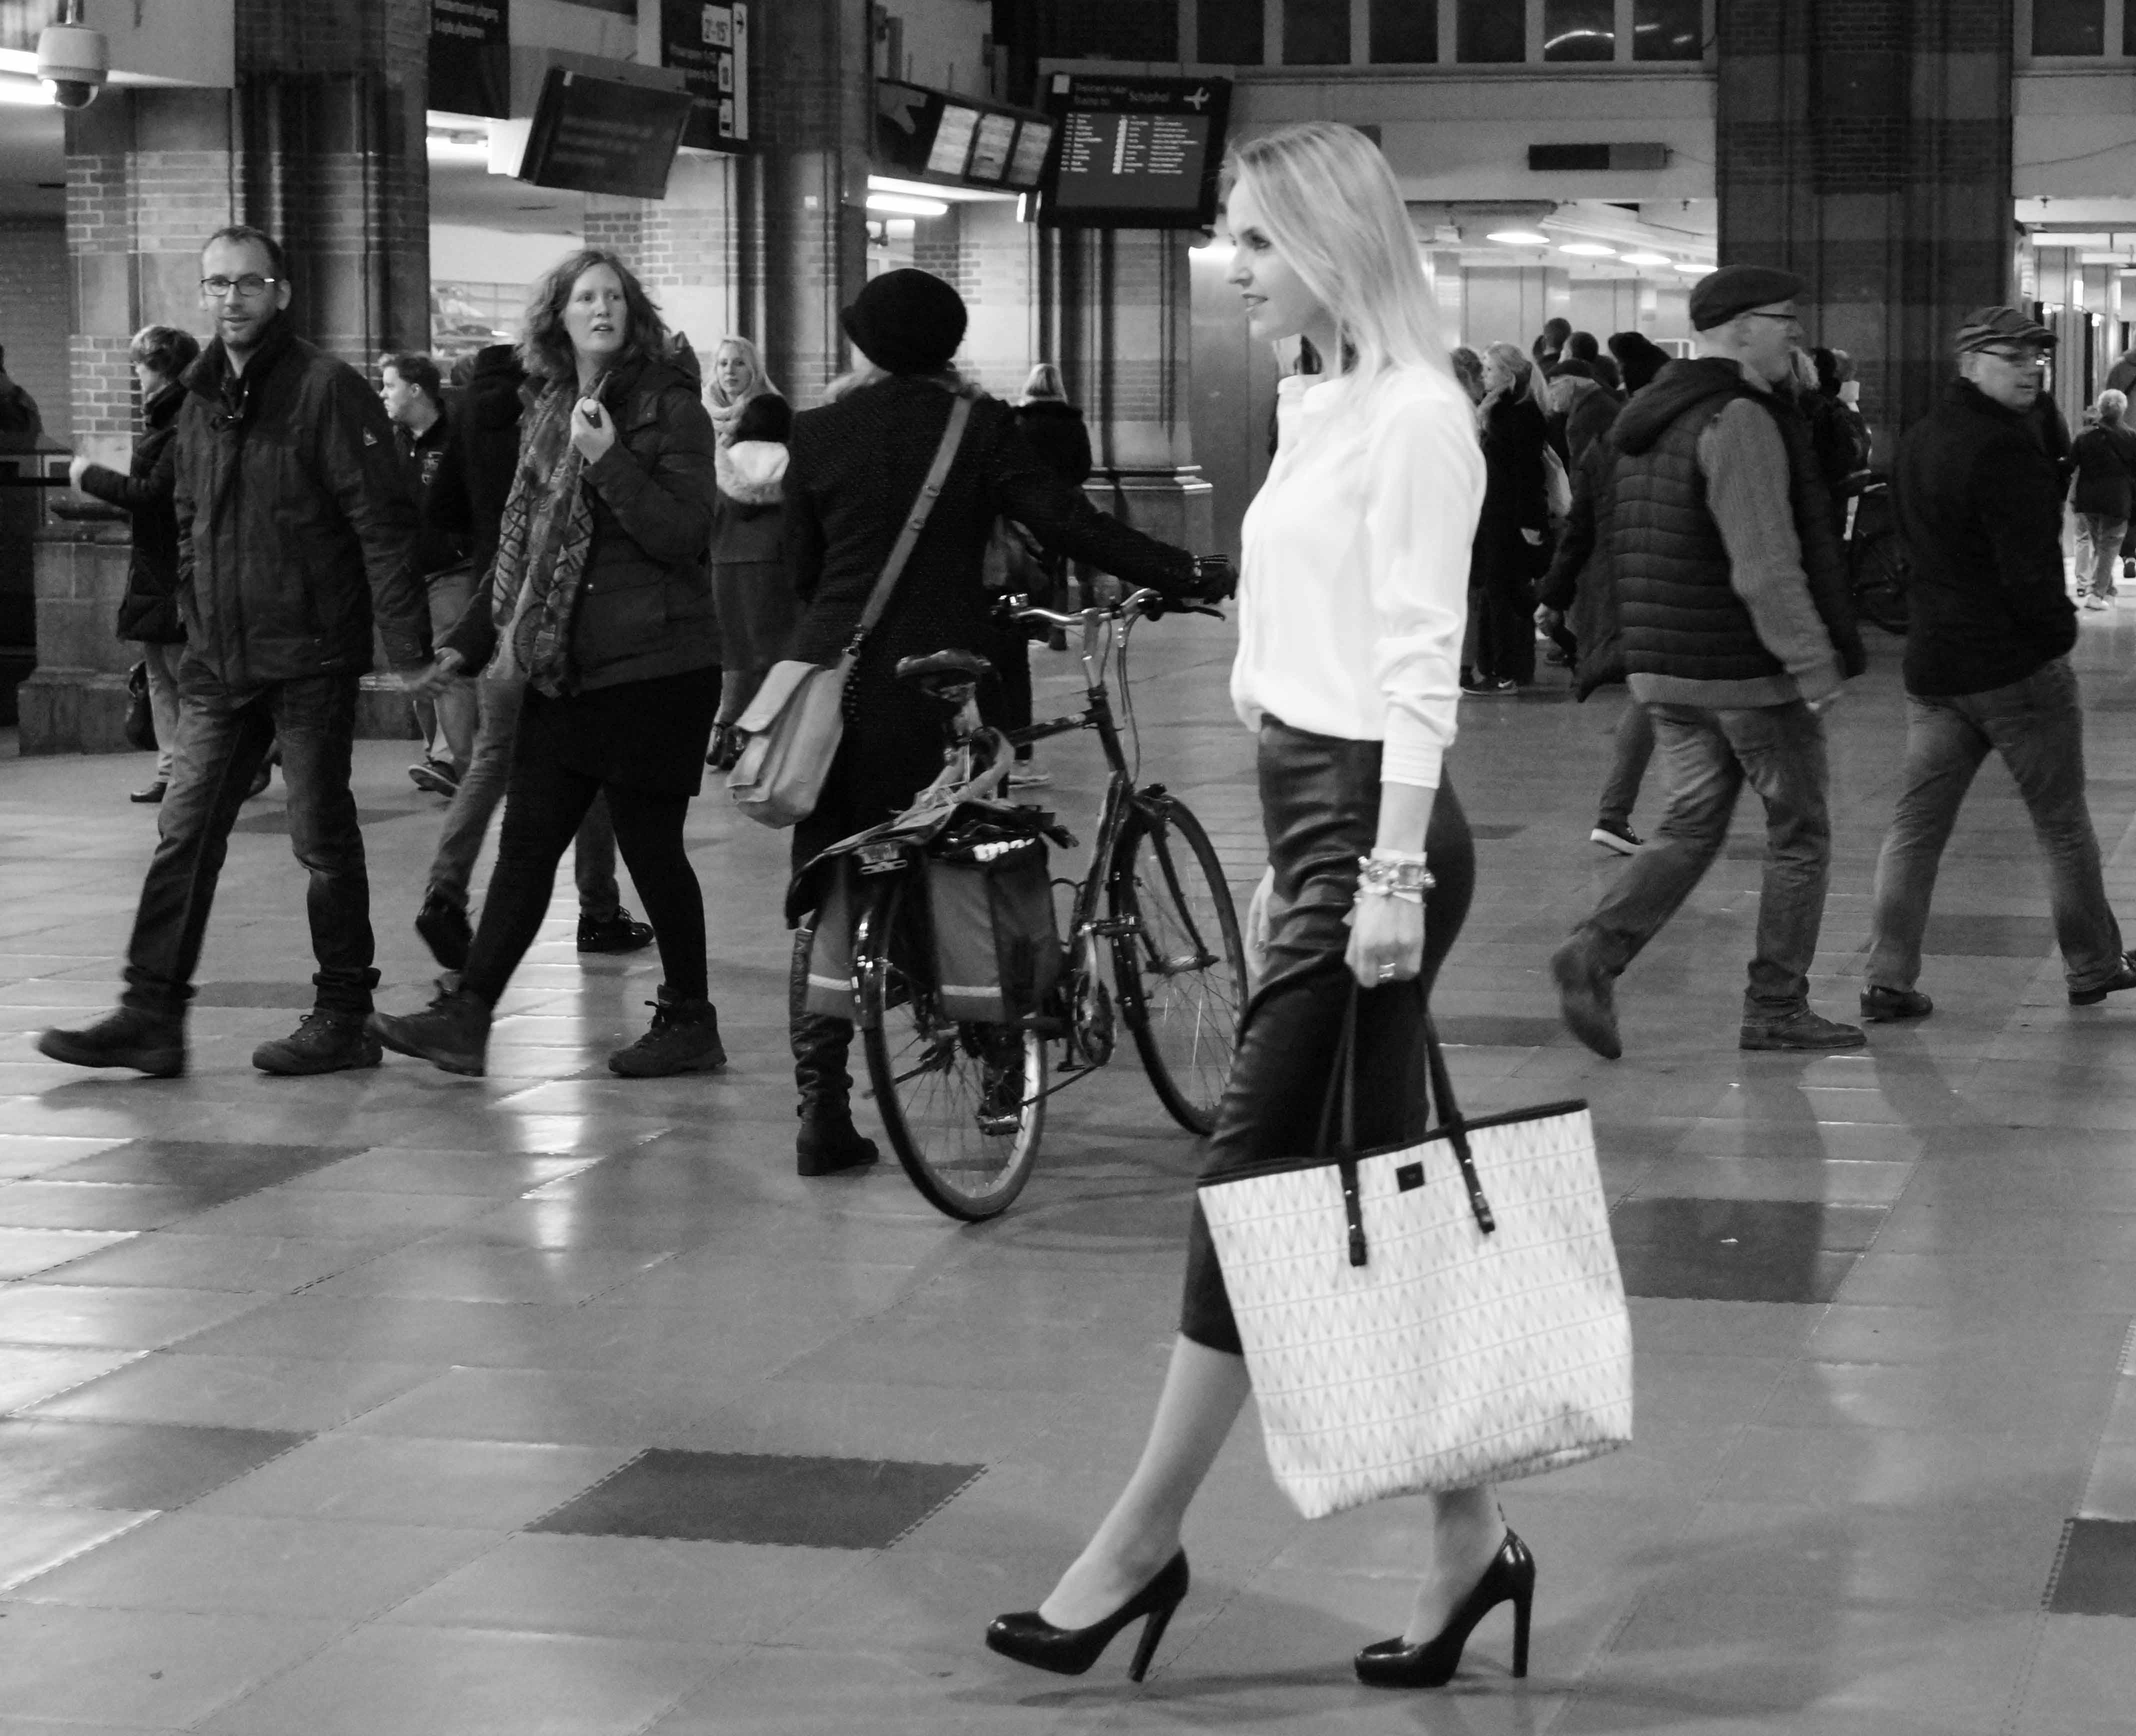 c8470910c2 Bag at You - House of Dagmar Shopper Bag at You - Dagmar Bag Swedish Fashion  ...